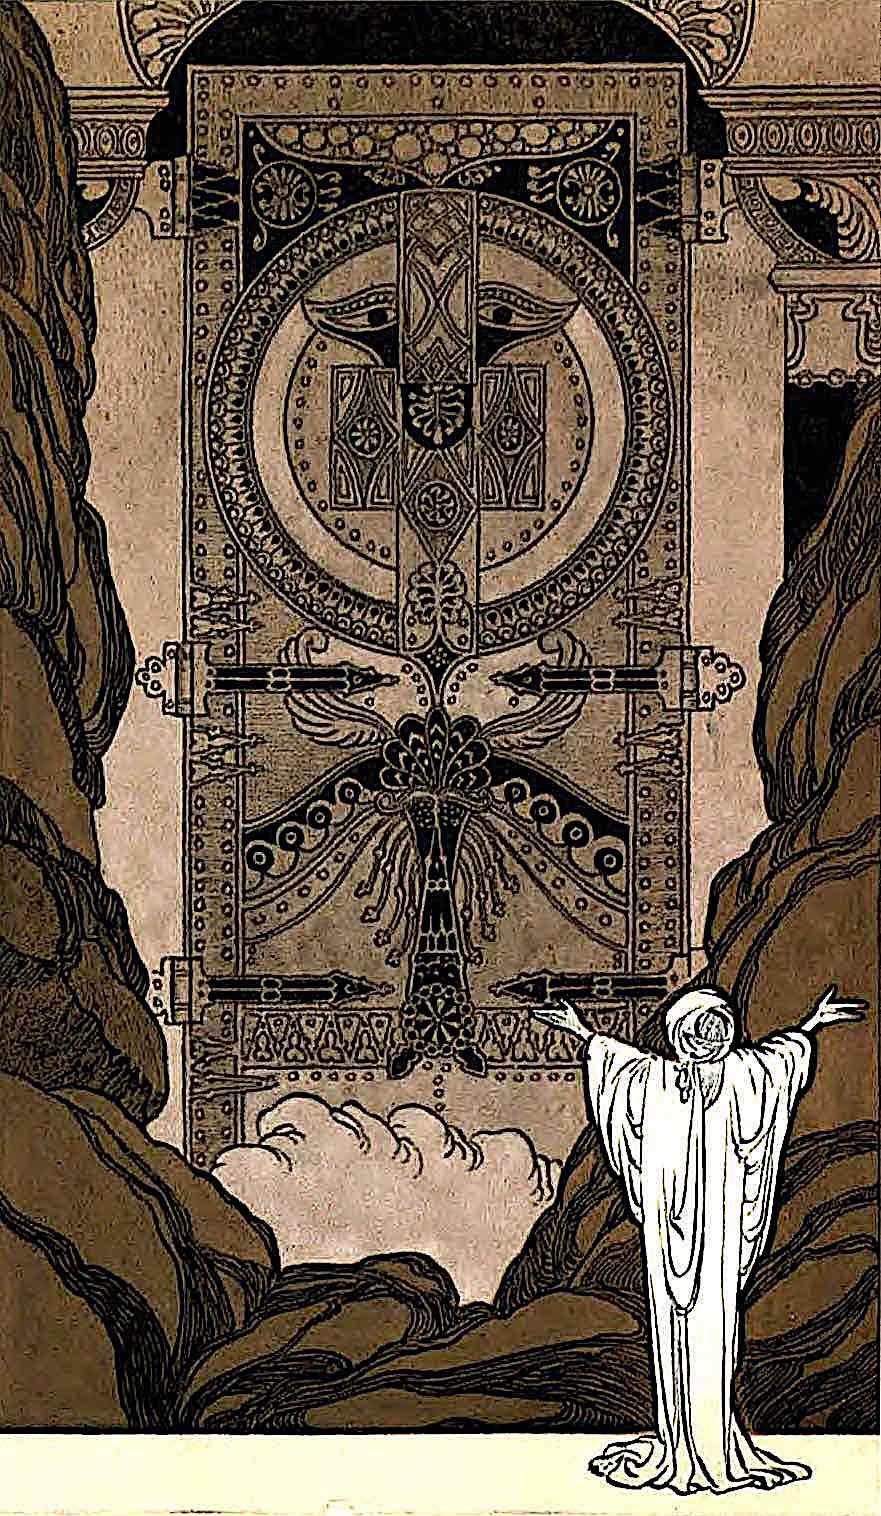 a Rene Bull illustration 1913, a figure summoning open giant gates